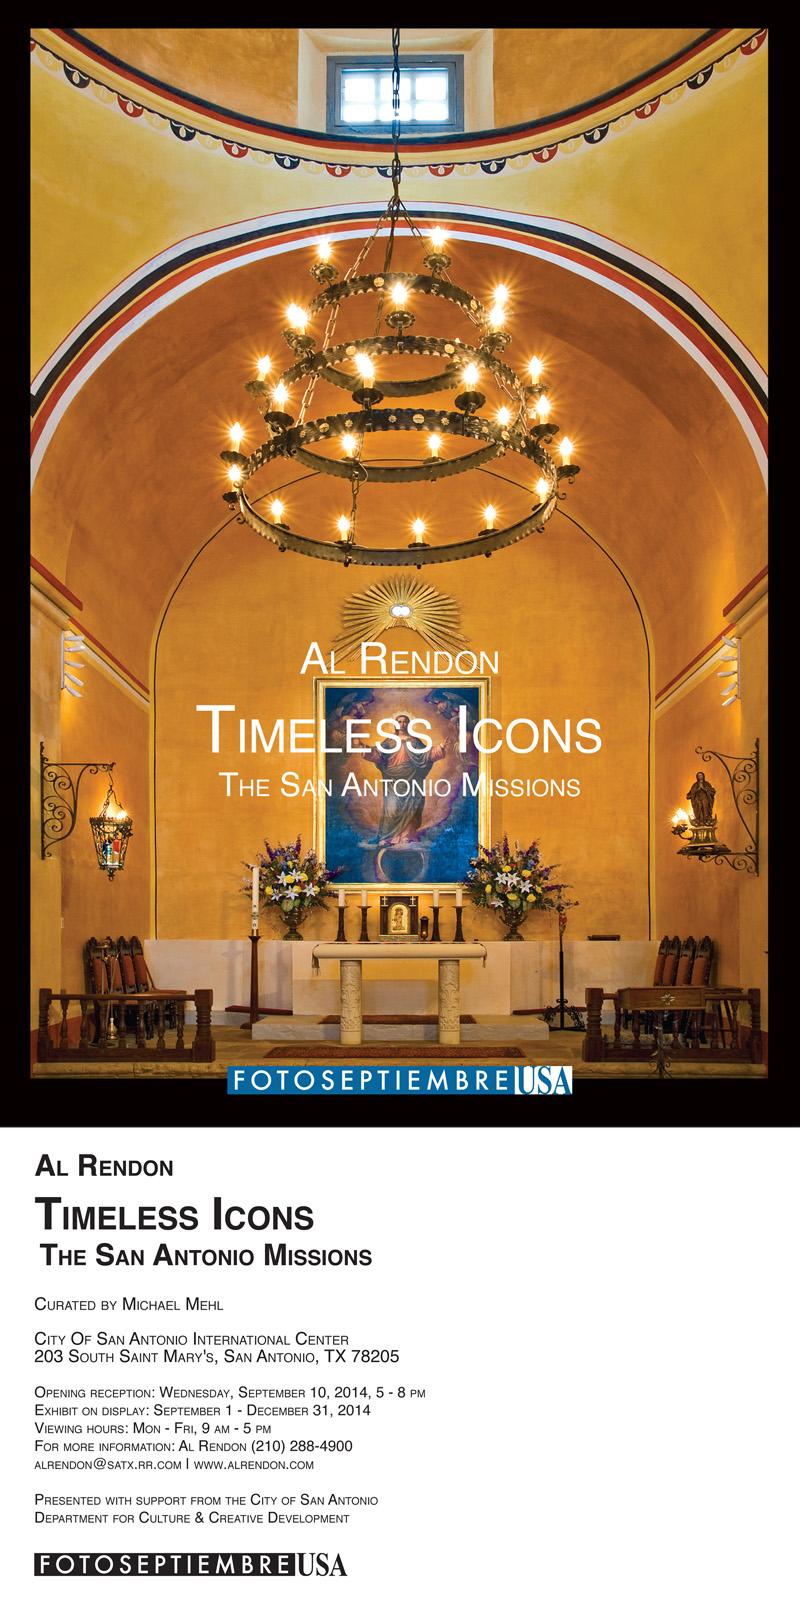 Michael-Mehl_Curator_FOTOSEPTIEMBRE-USA_Timeless-Icons-Exhibit_City-Of-San-Antonio-International-Center_Promotional-Card